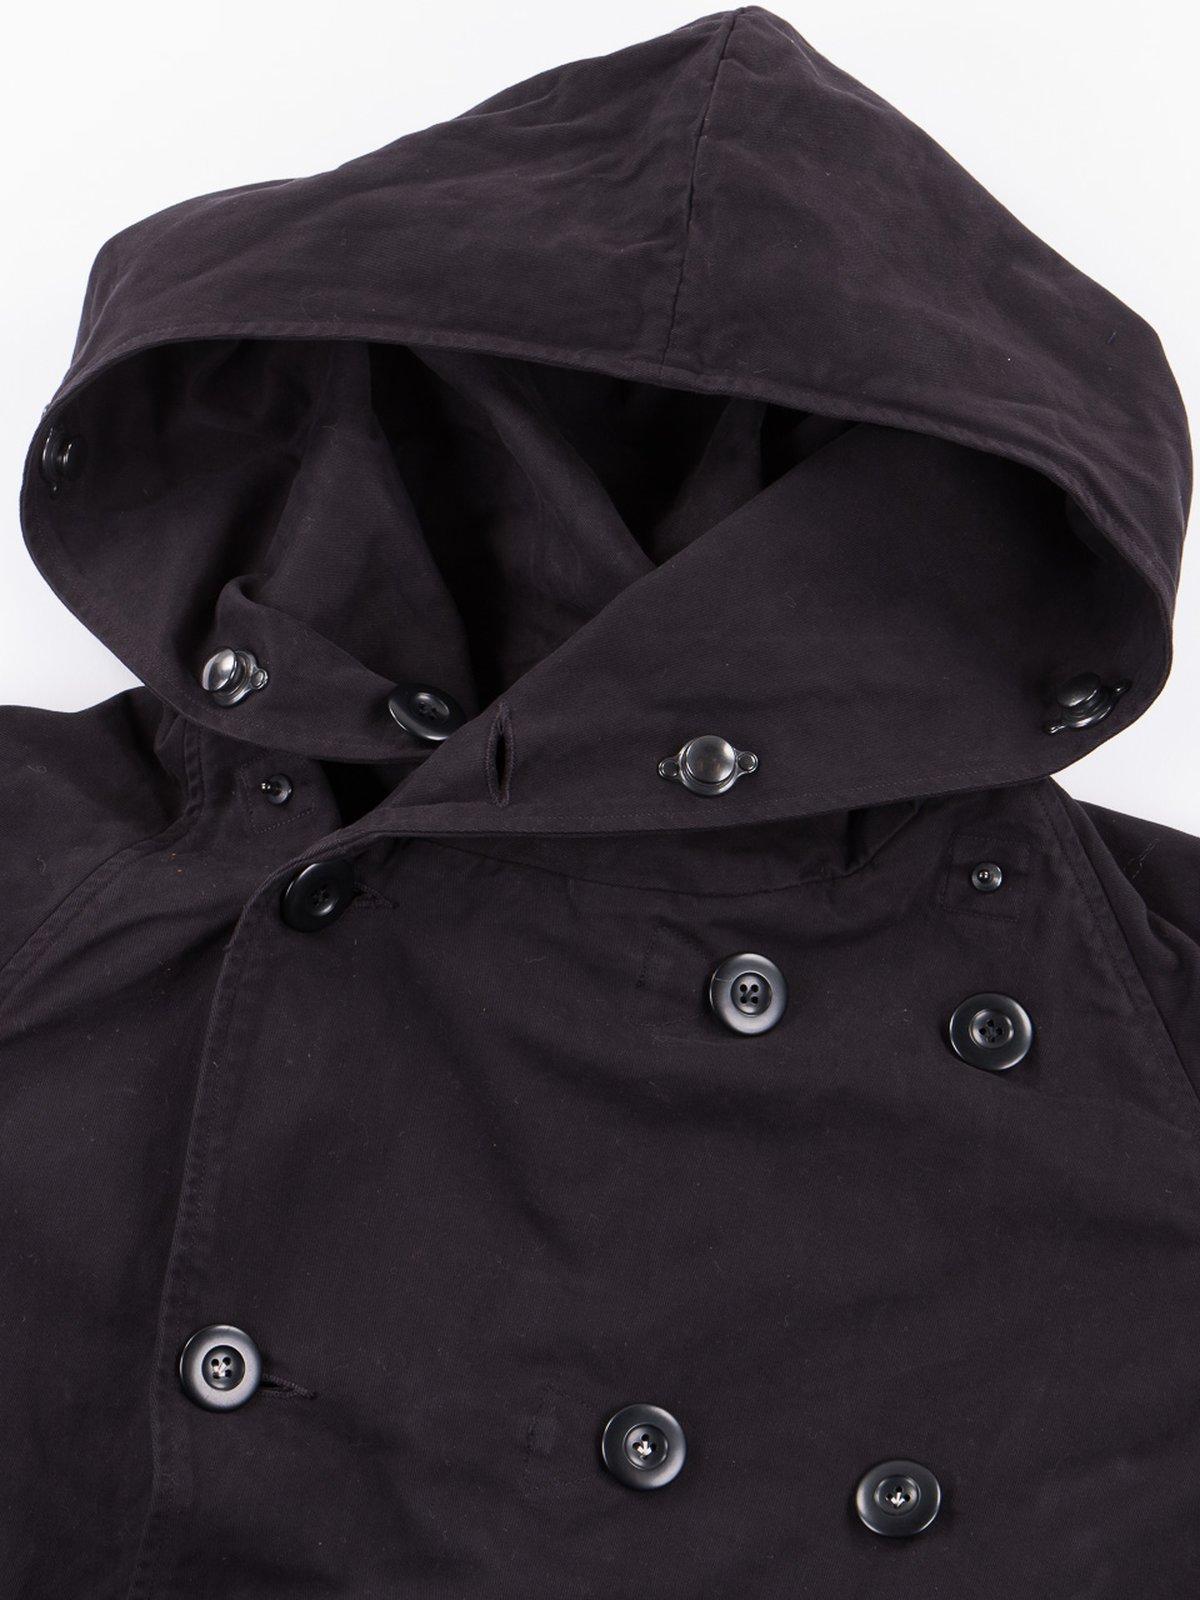 Black Brushed Twill Tri–P Ring Coat - Image 7